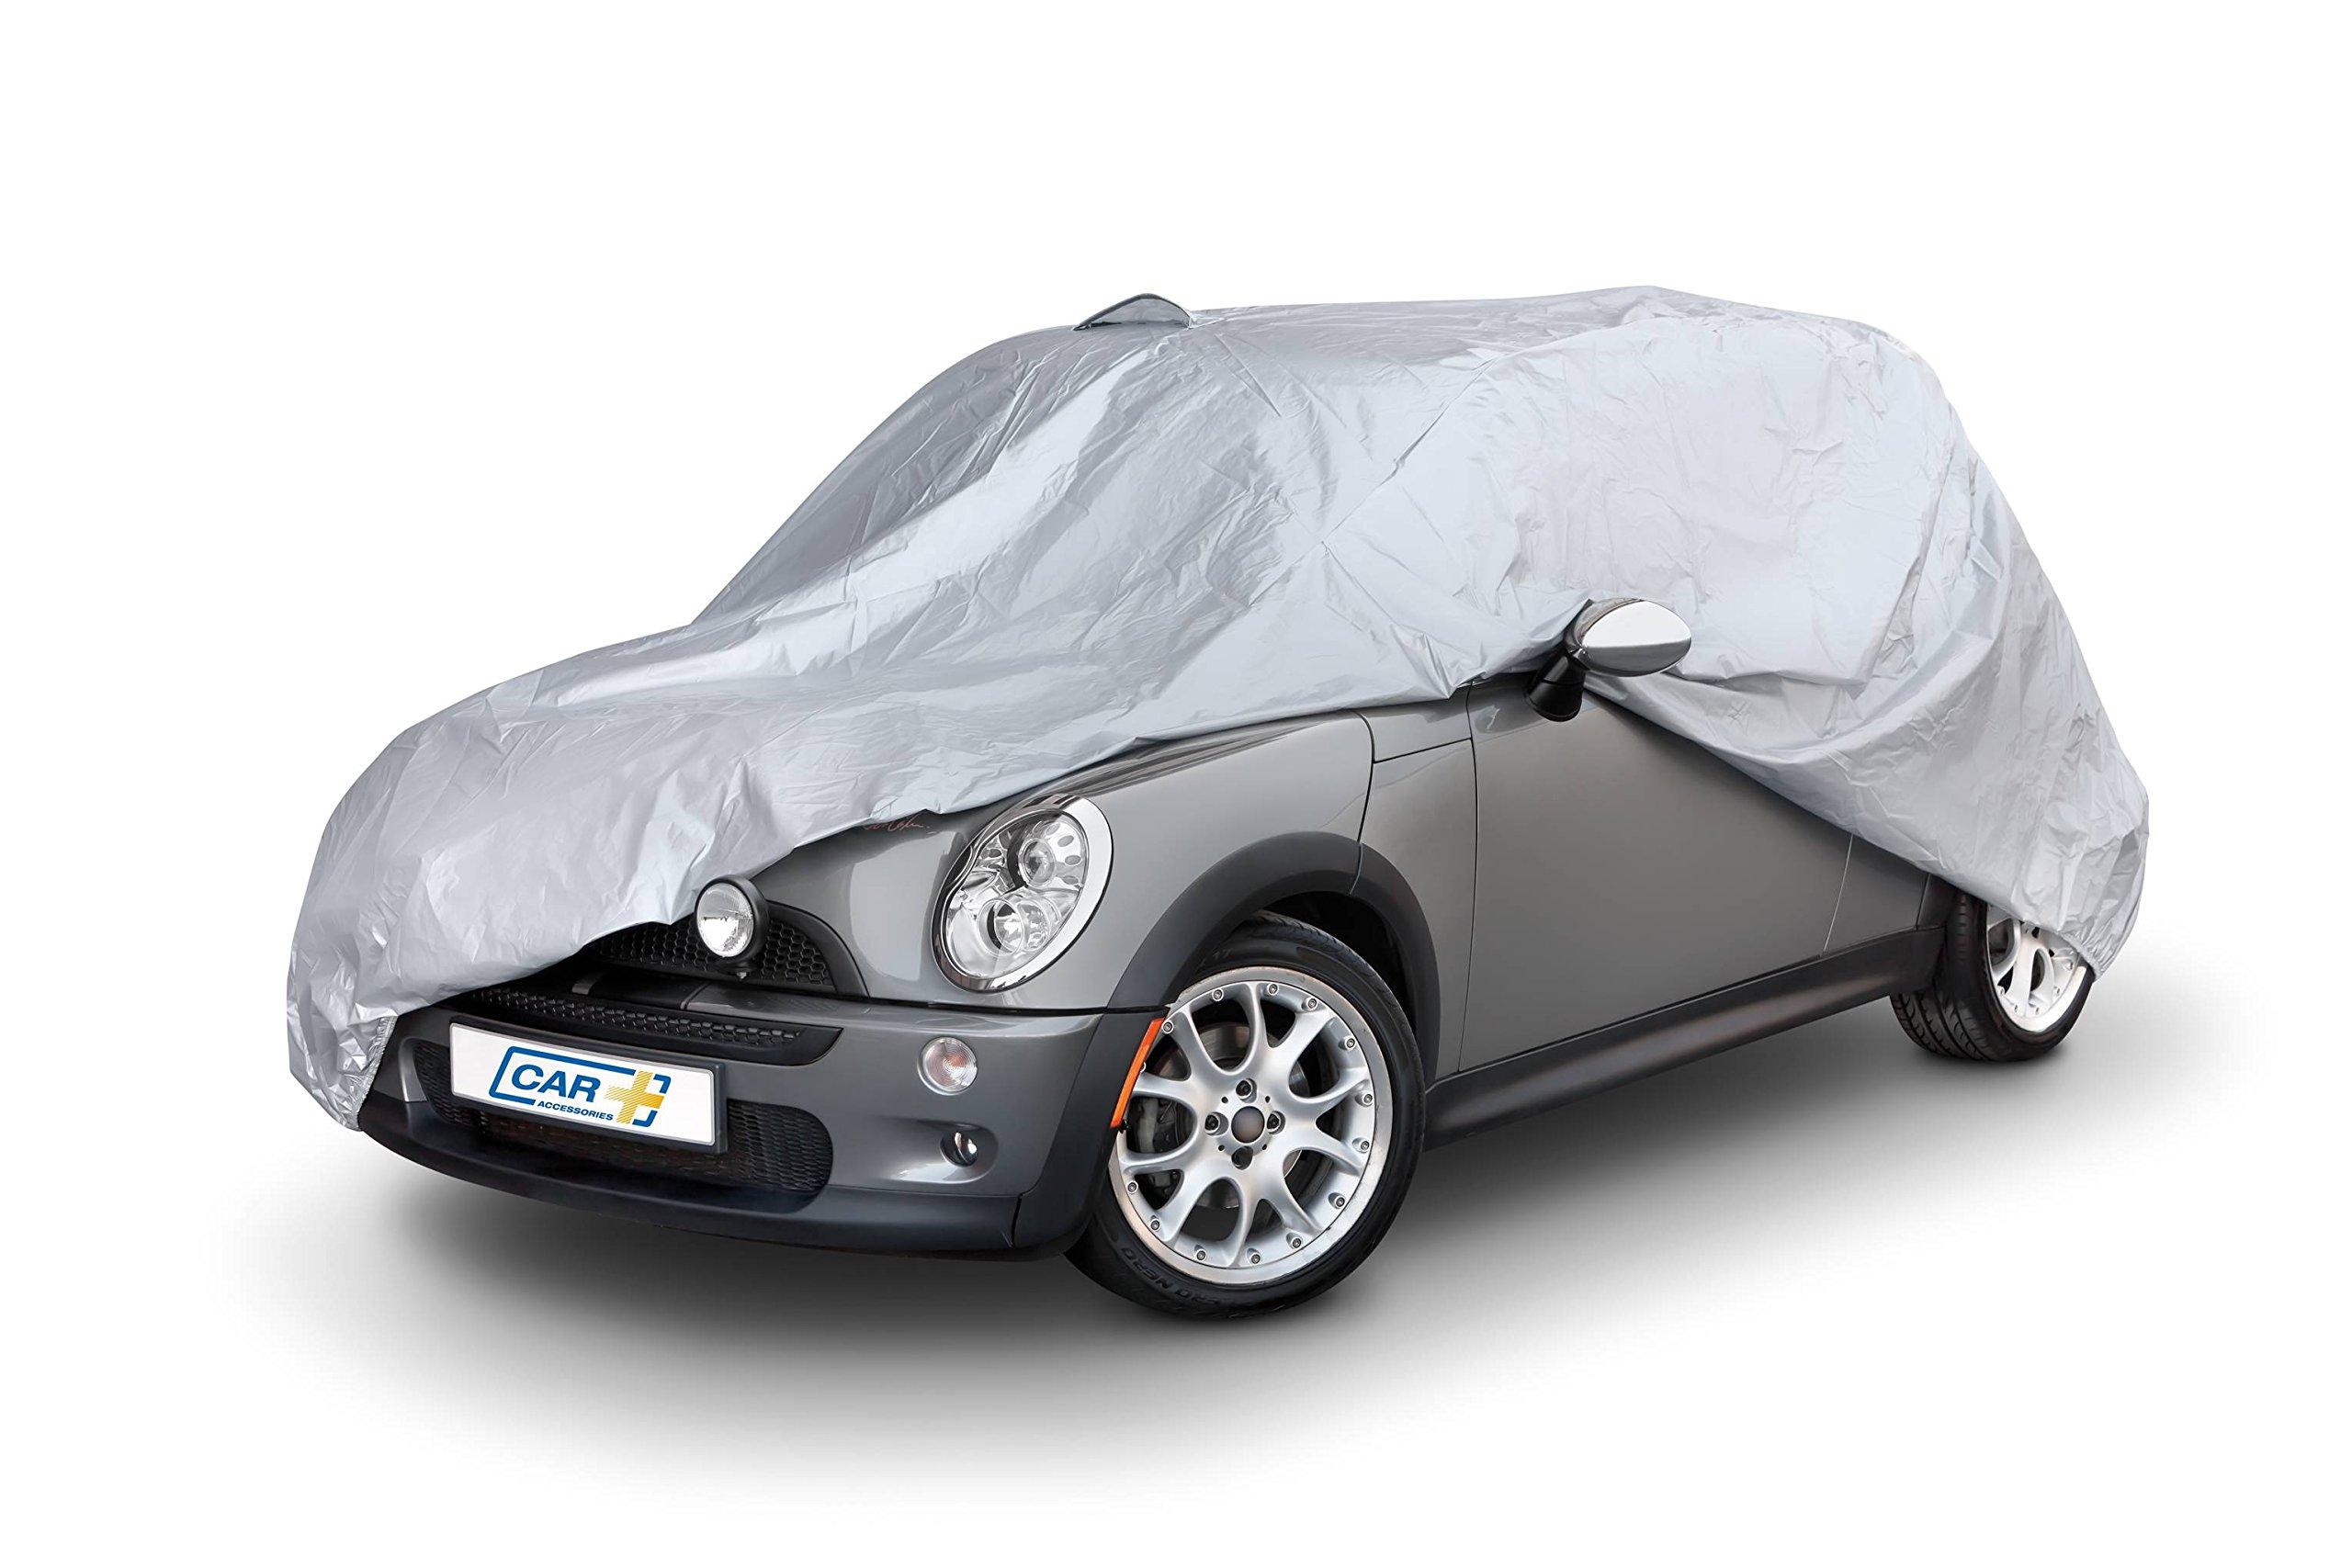 Funda exterior premium para Mini COOPER, impermeable, doble capa sintética y de finas trazas